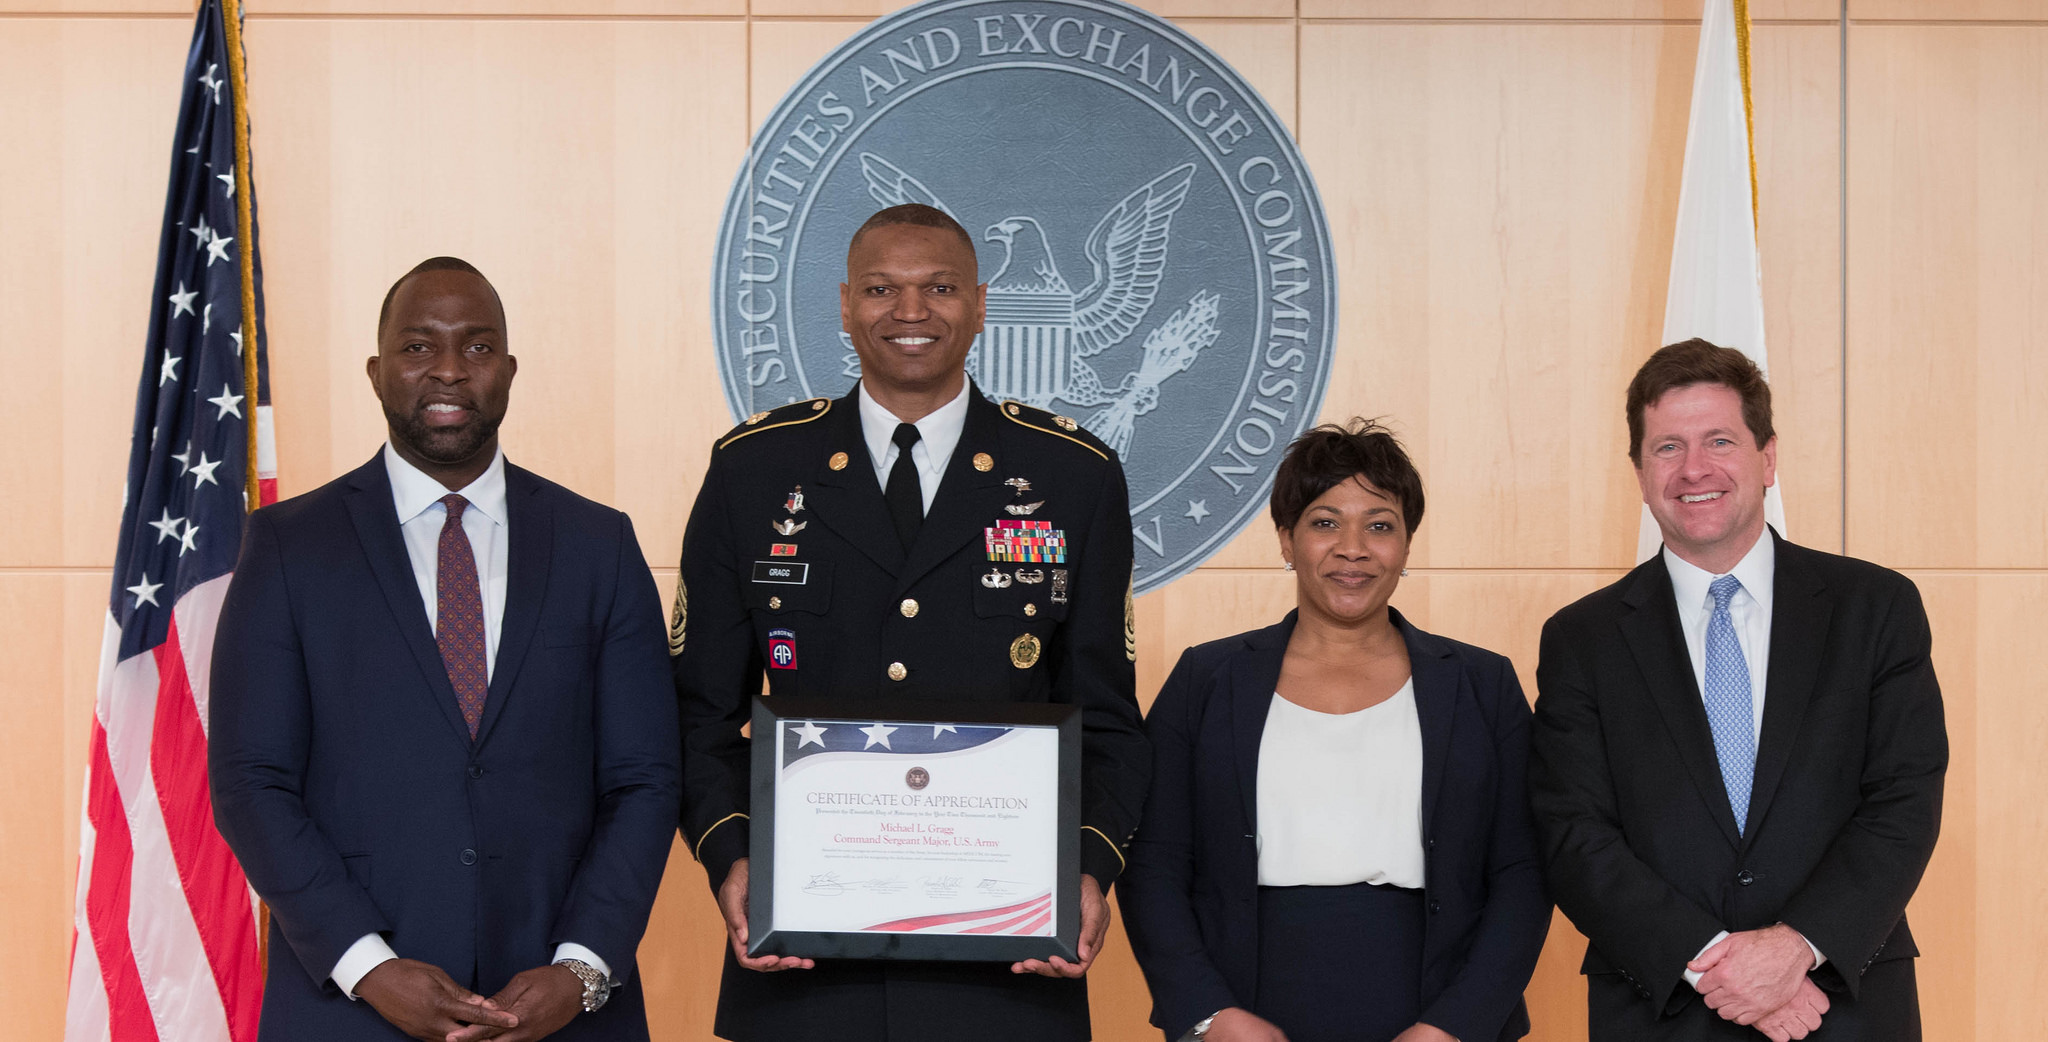 Left to right: Olawale Oriola, Command Sgt. Maj. Michael L. Gragg, Naseem Nixon, Chairman Jay Clayton